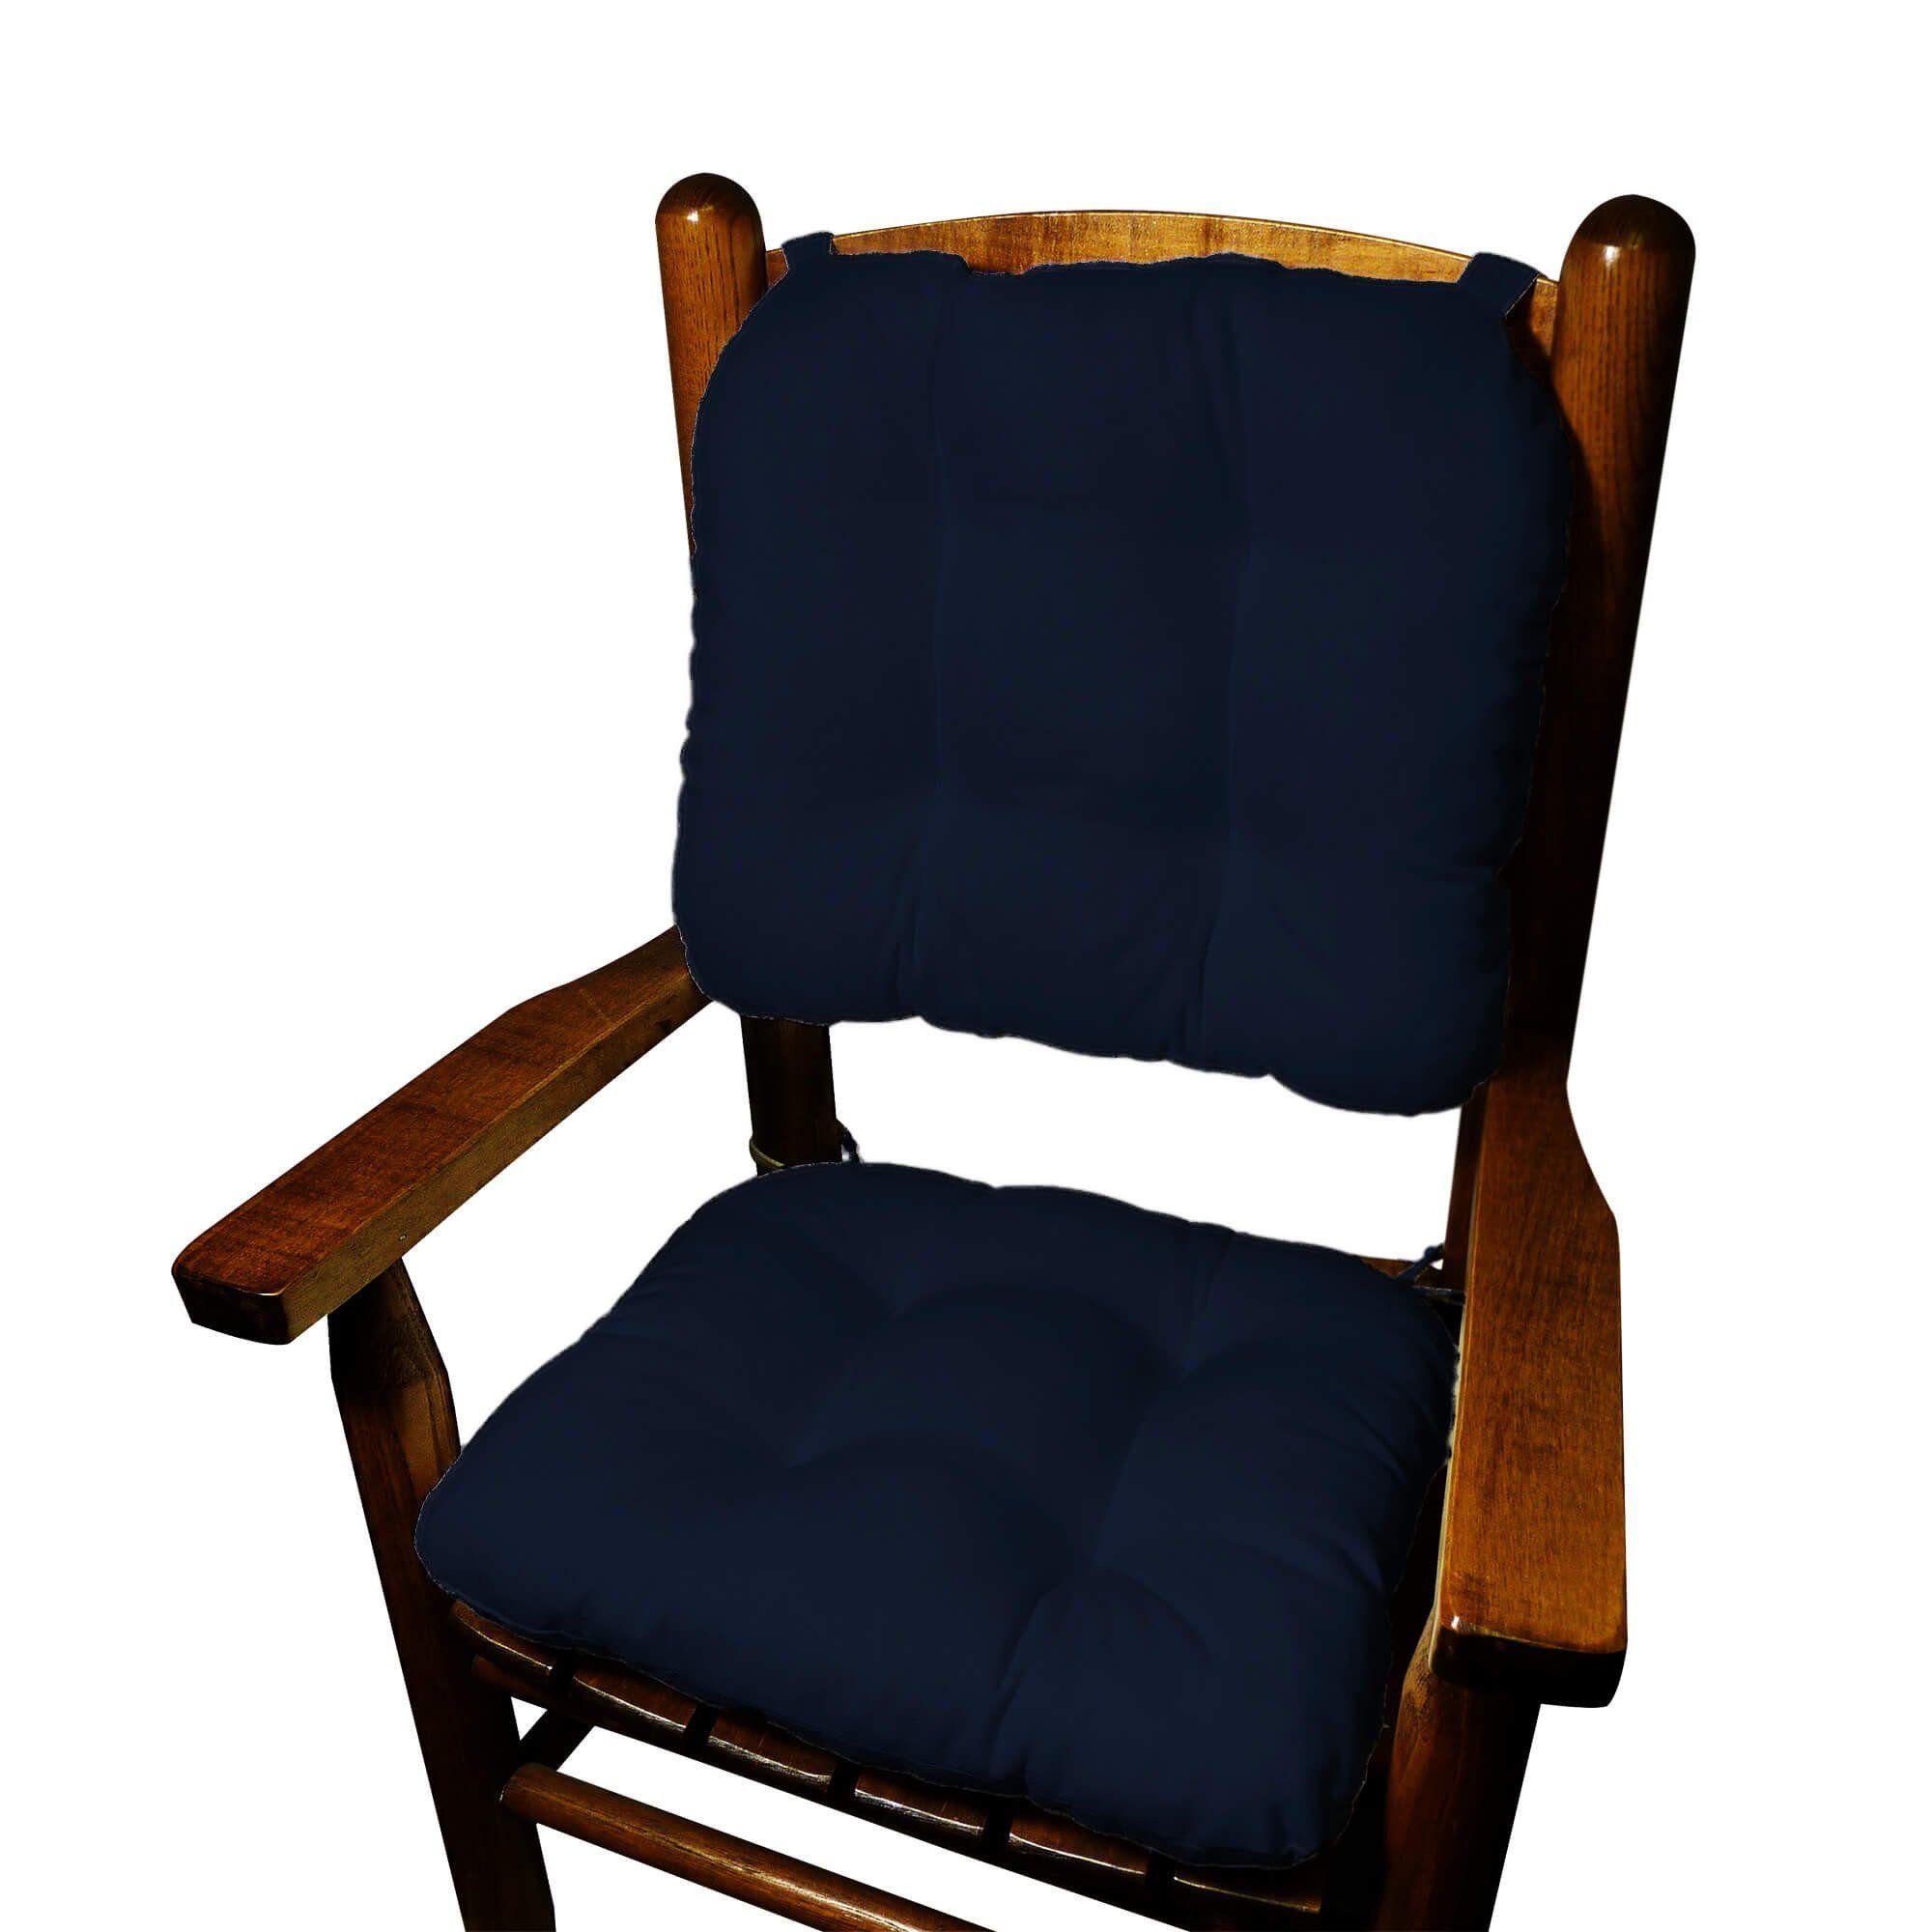 Child rocking chair cushions cotton duck navy blue